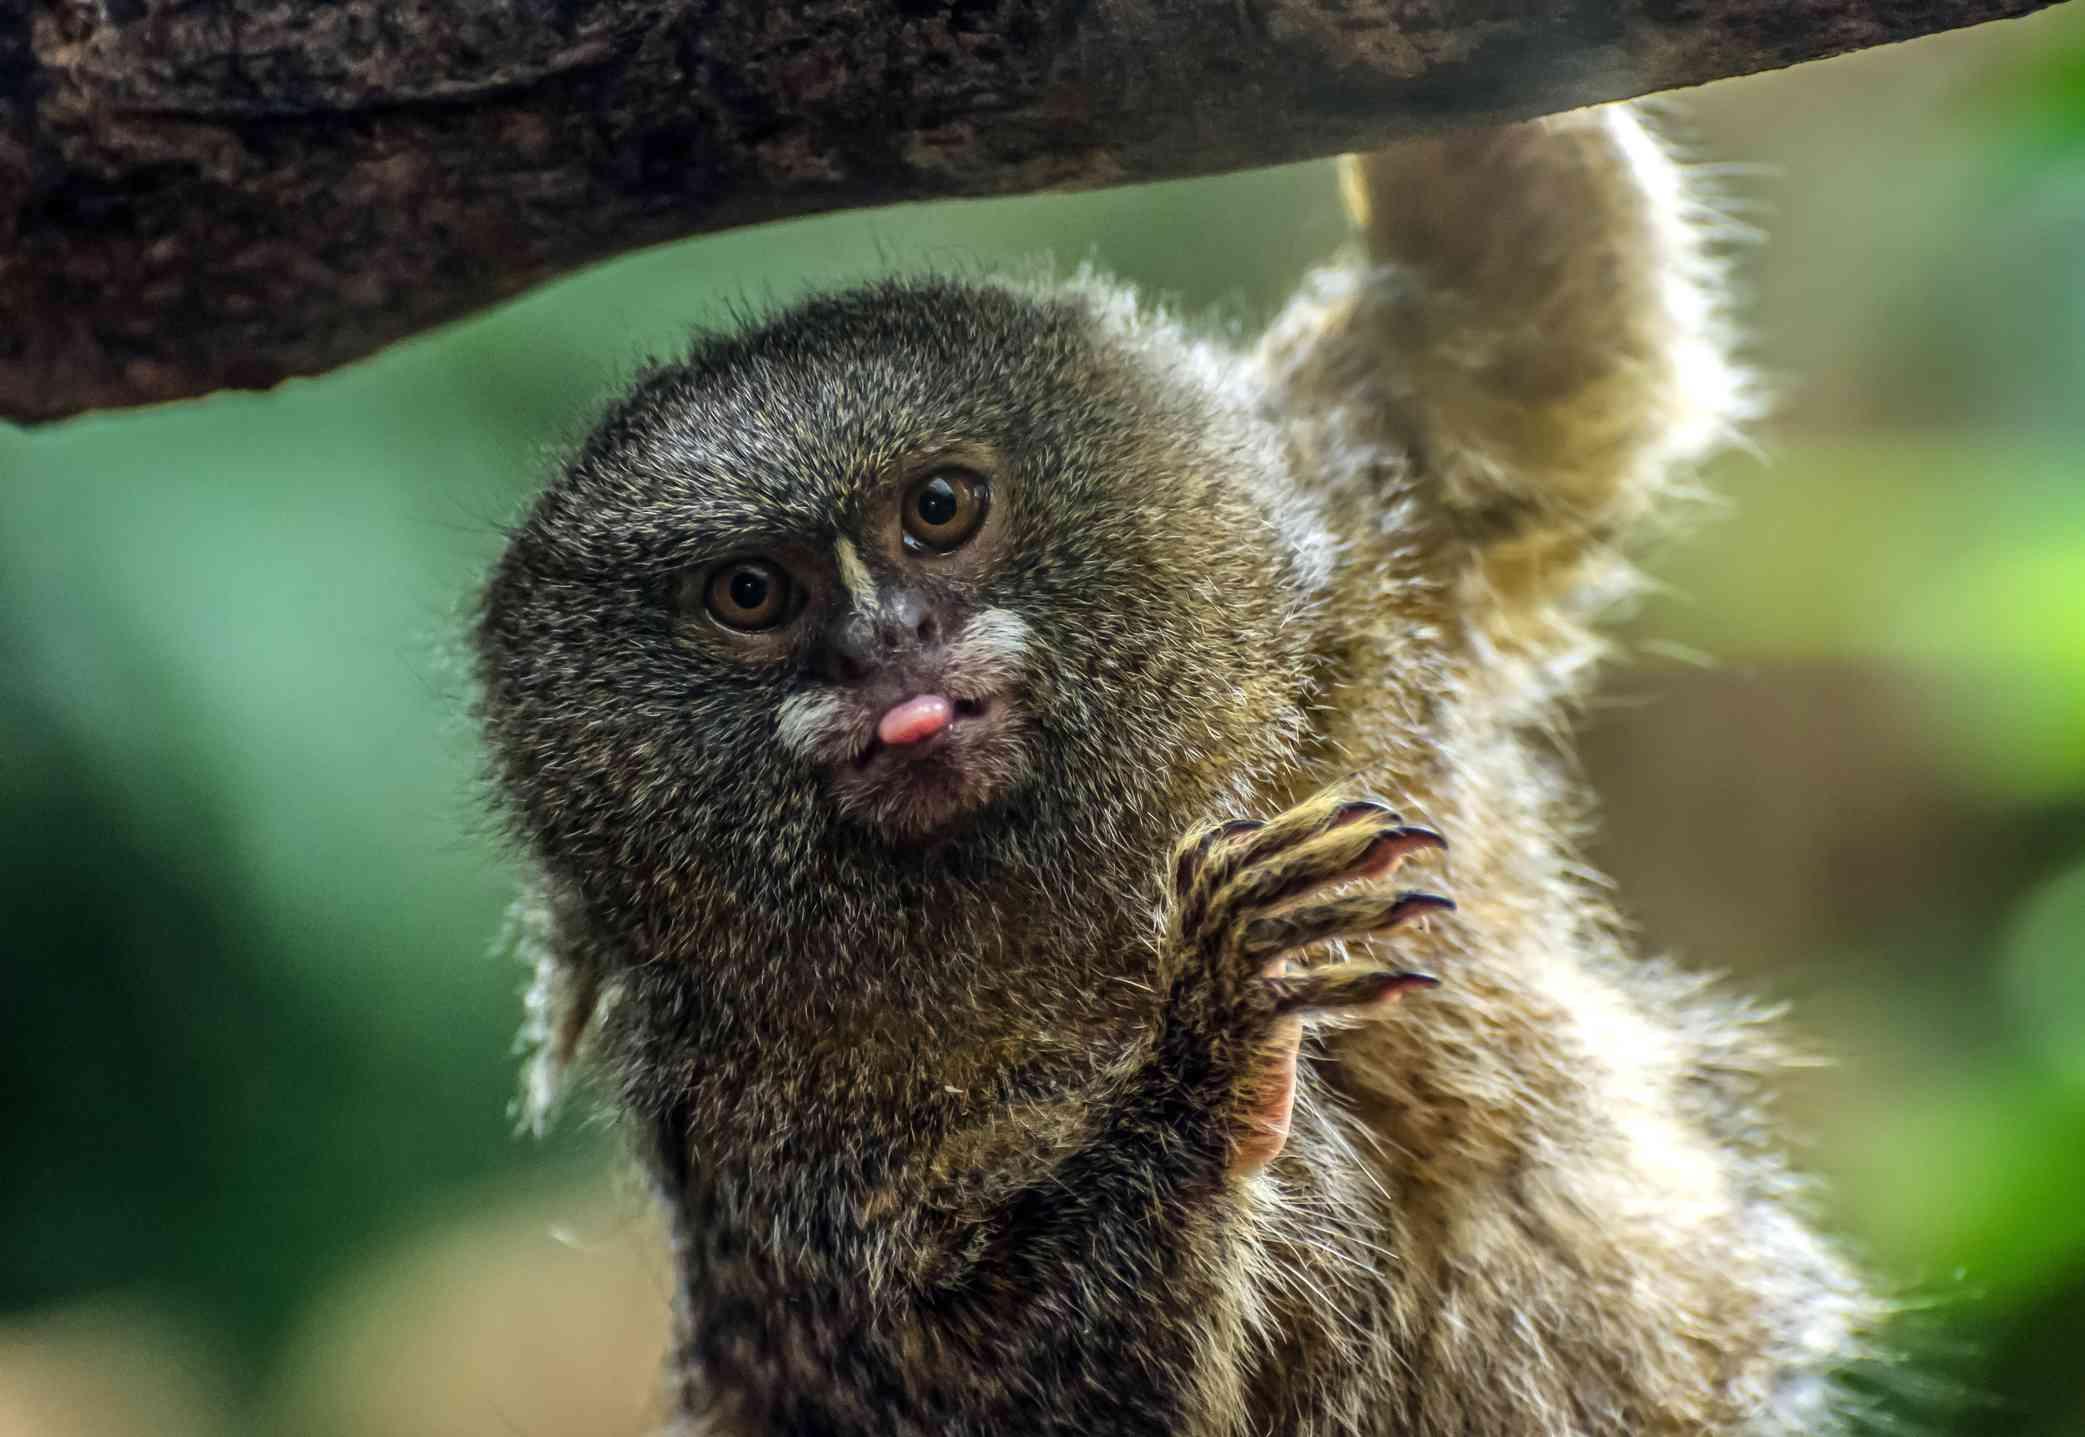 pygmy marmoset sticking out its tongue